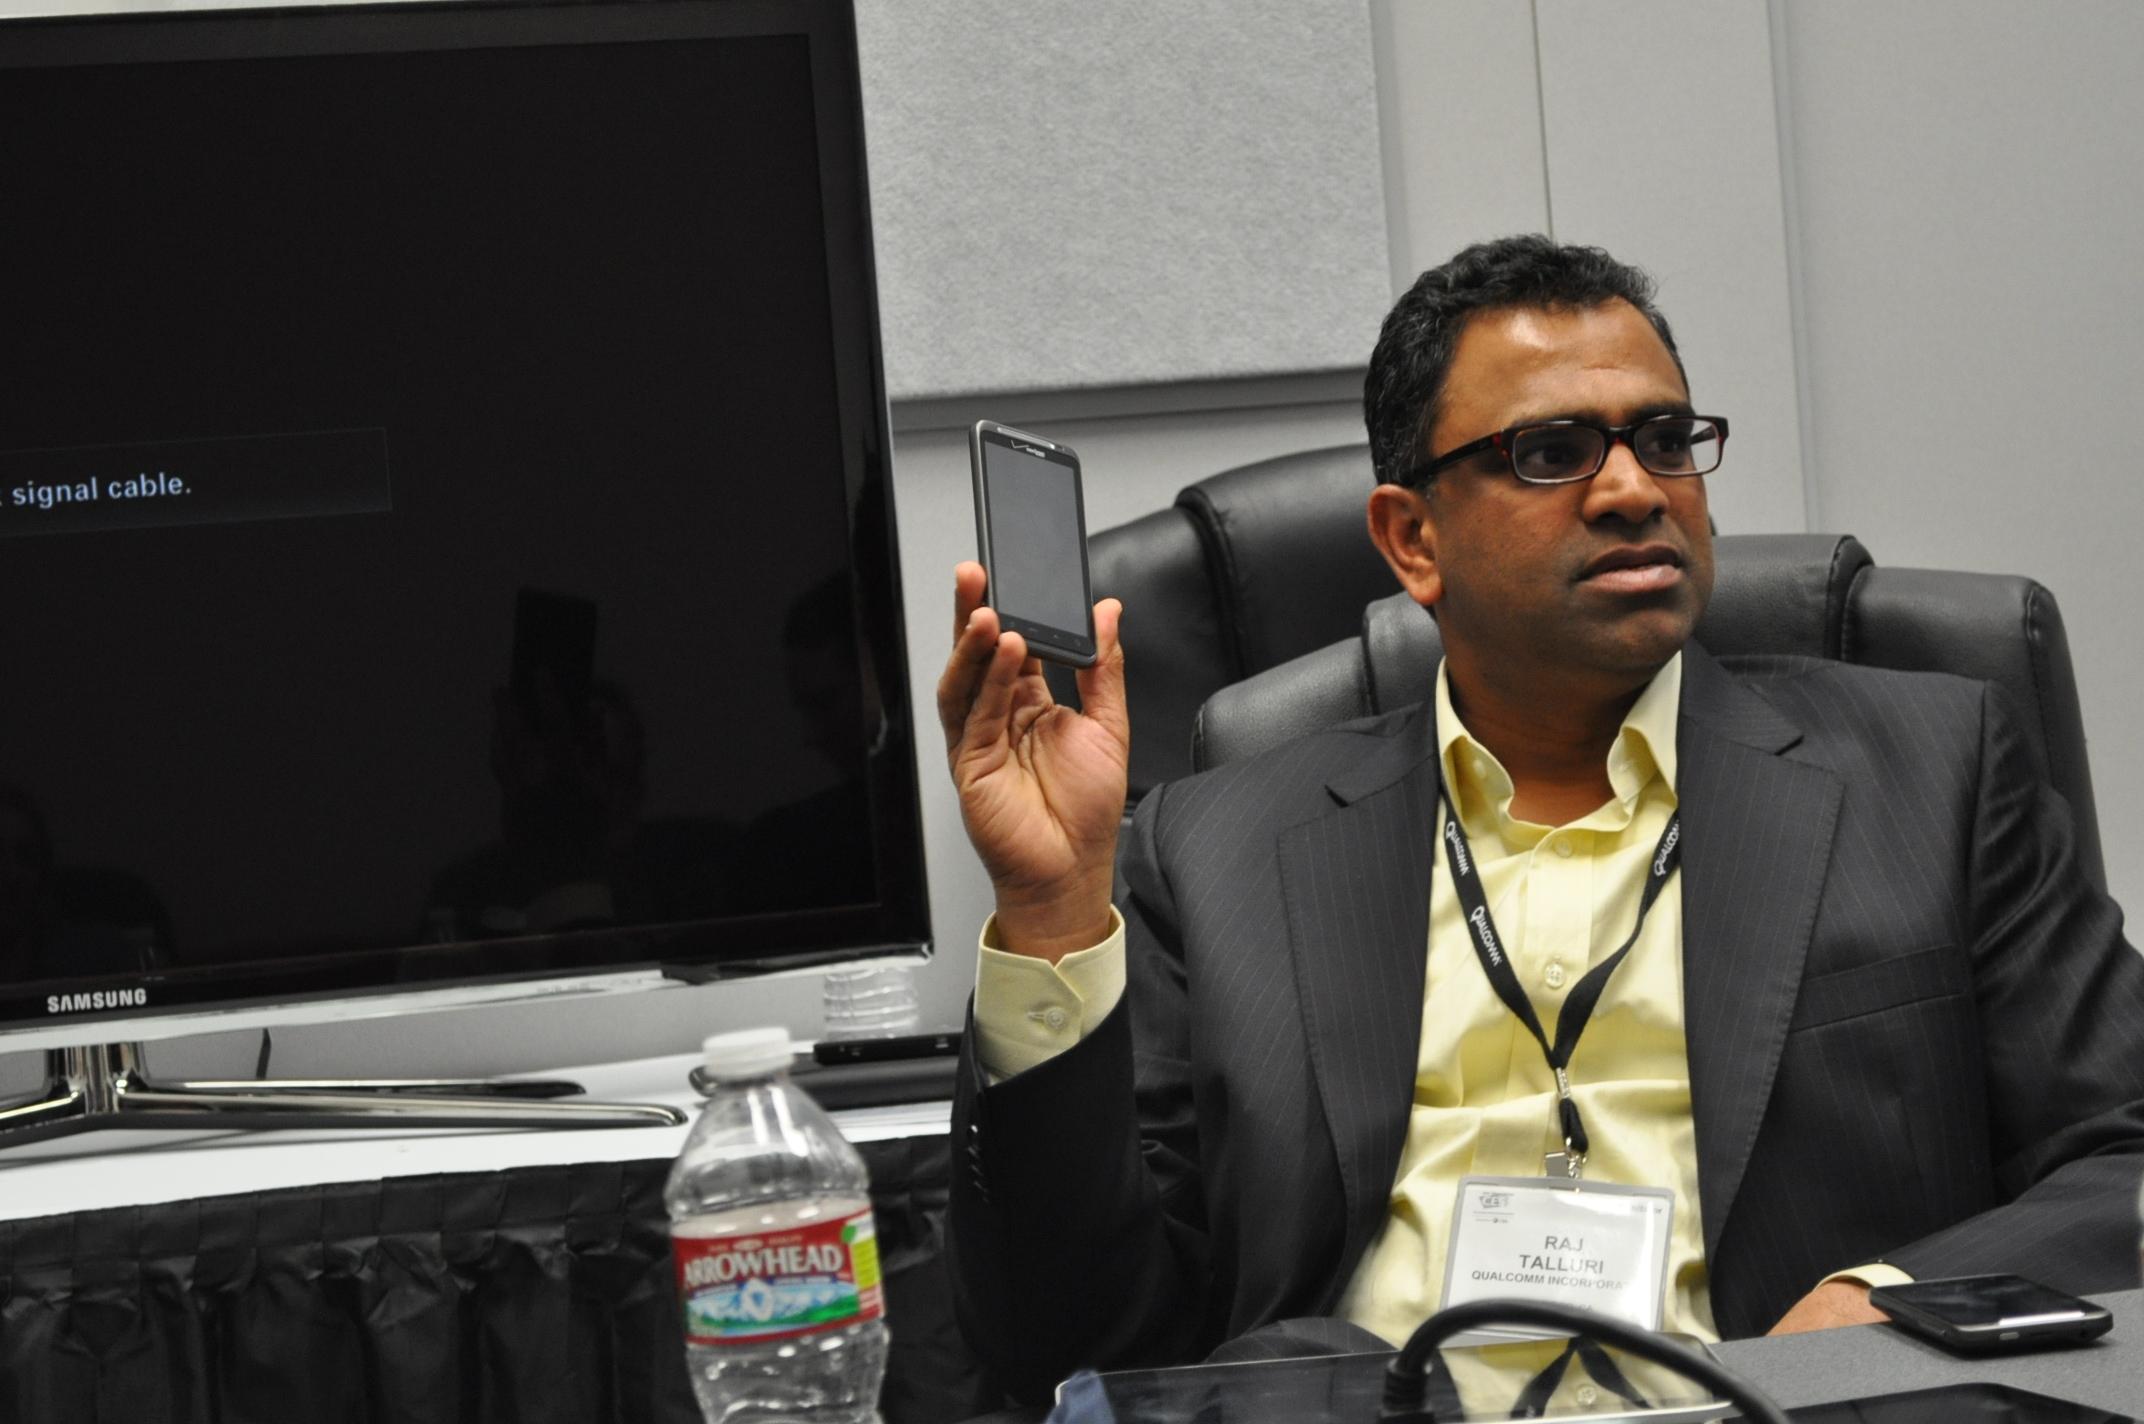 CES 2011: Qualcomm Demos Snapdragon MSM8660